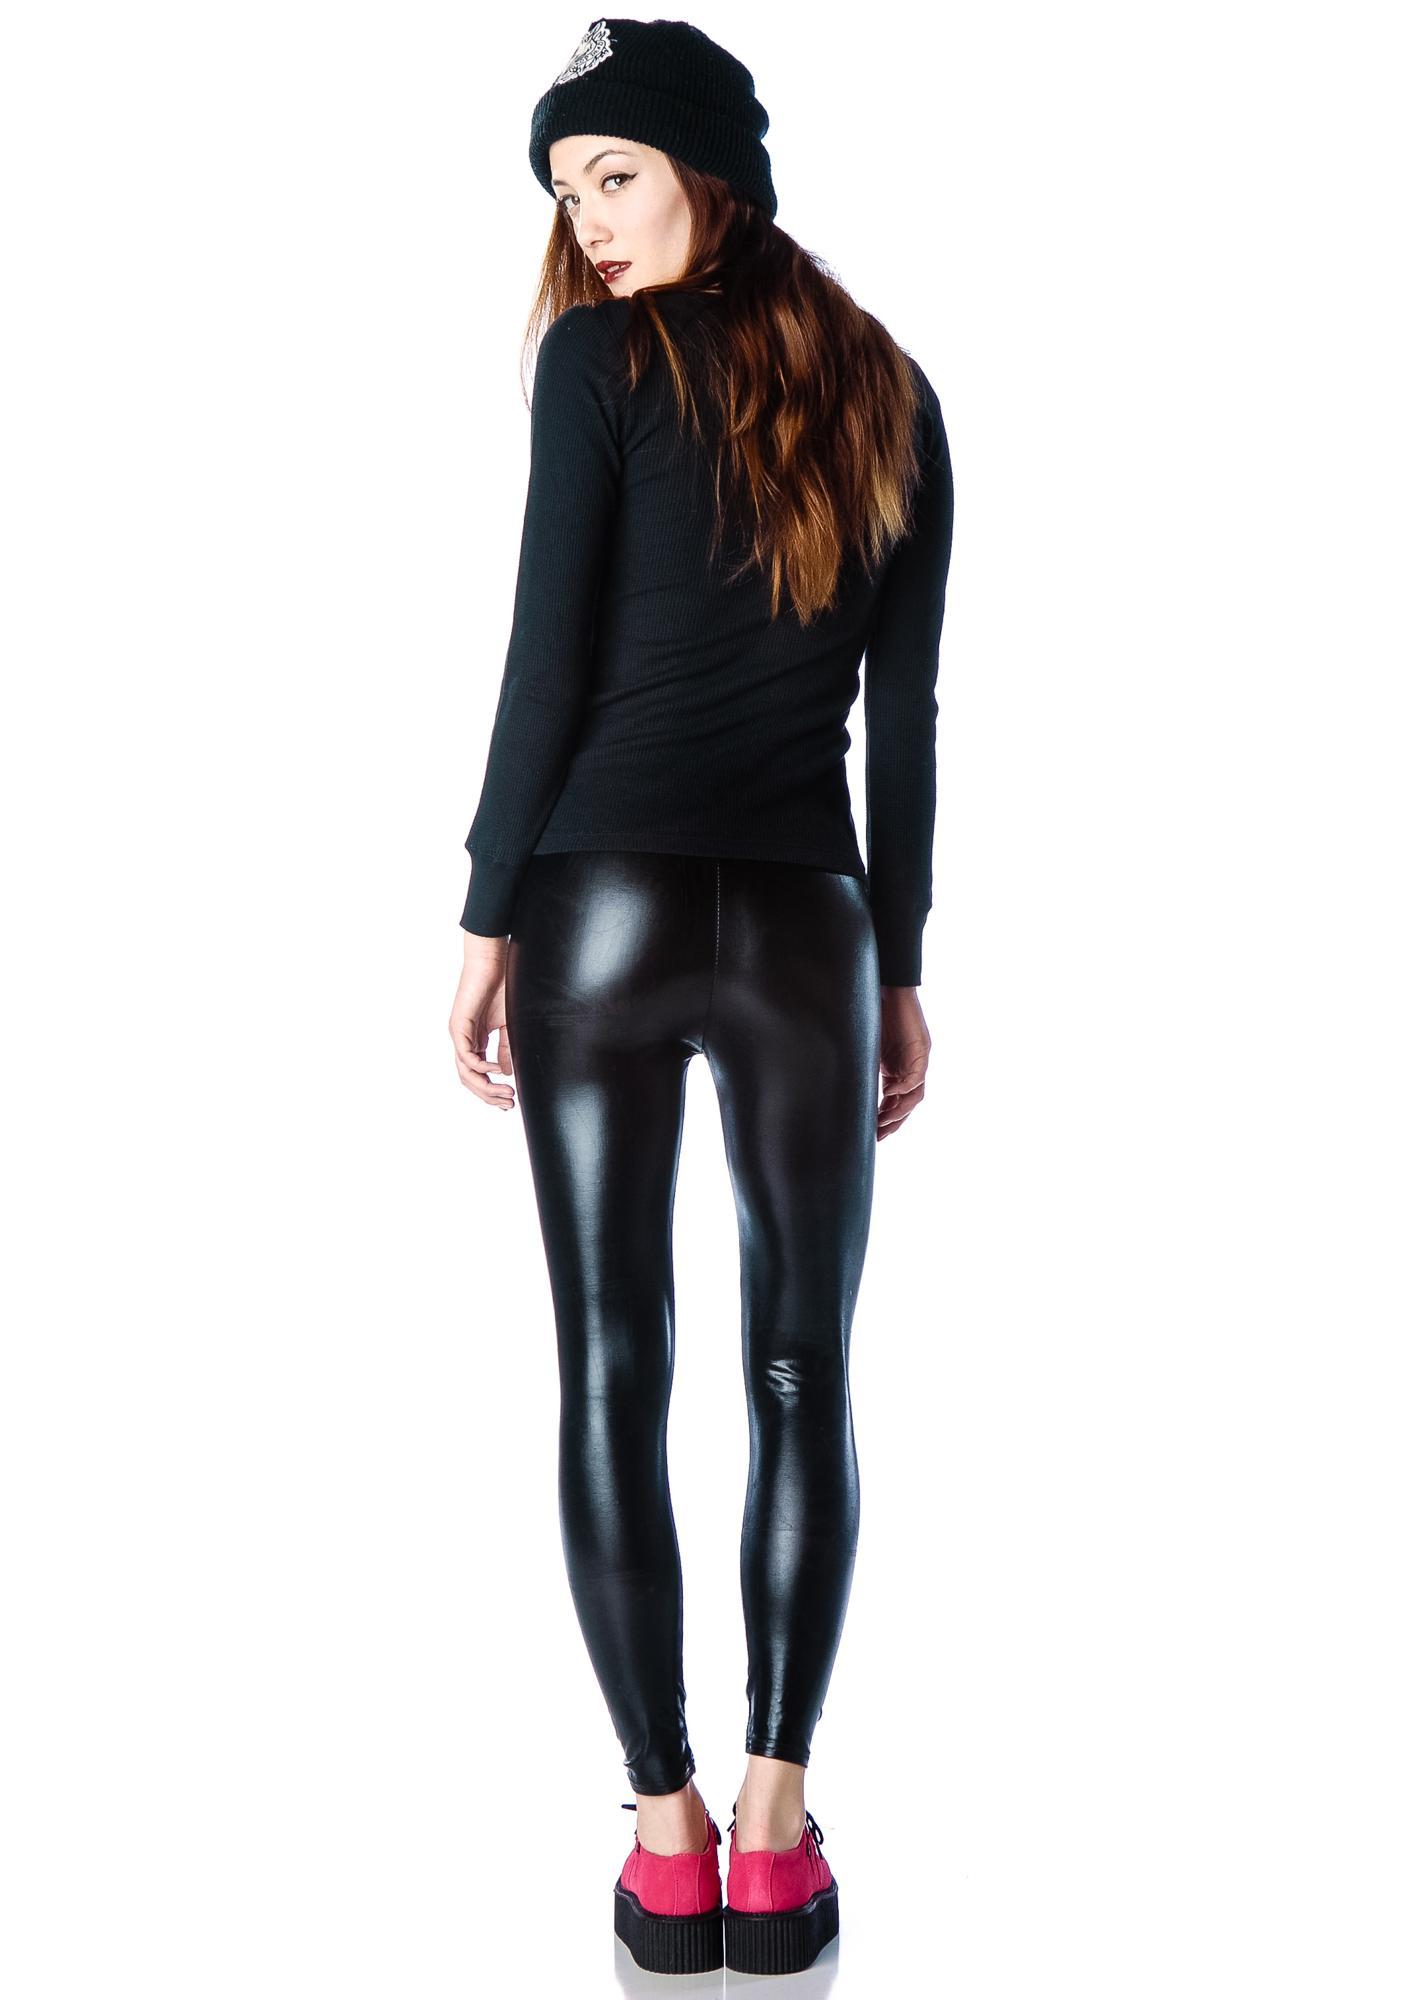 Ripper Leather Leggings